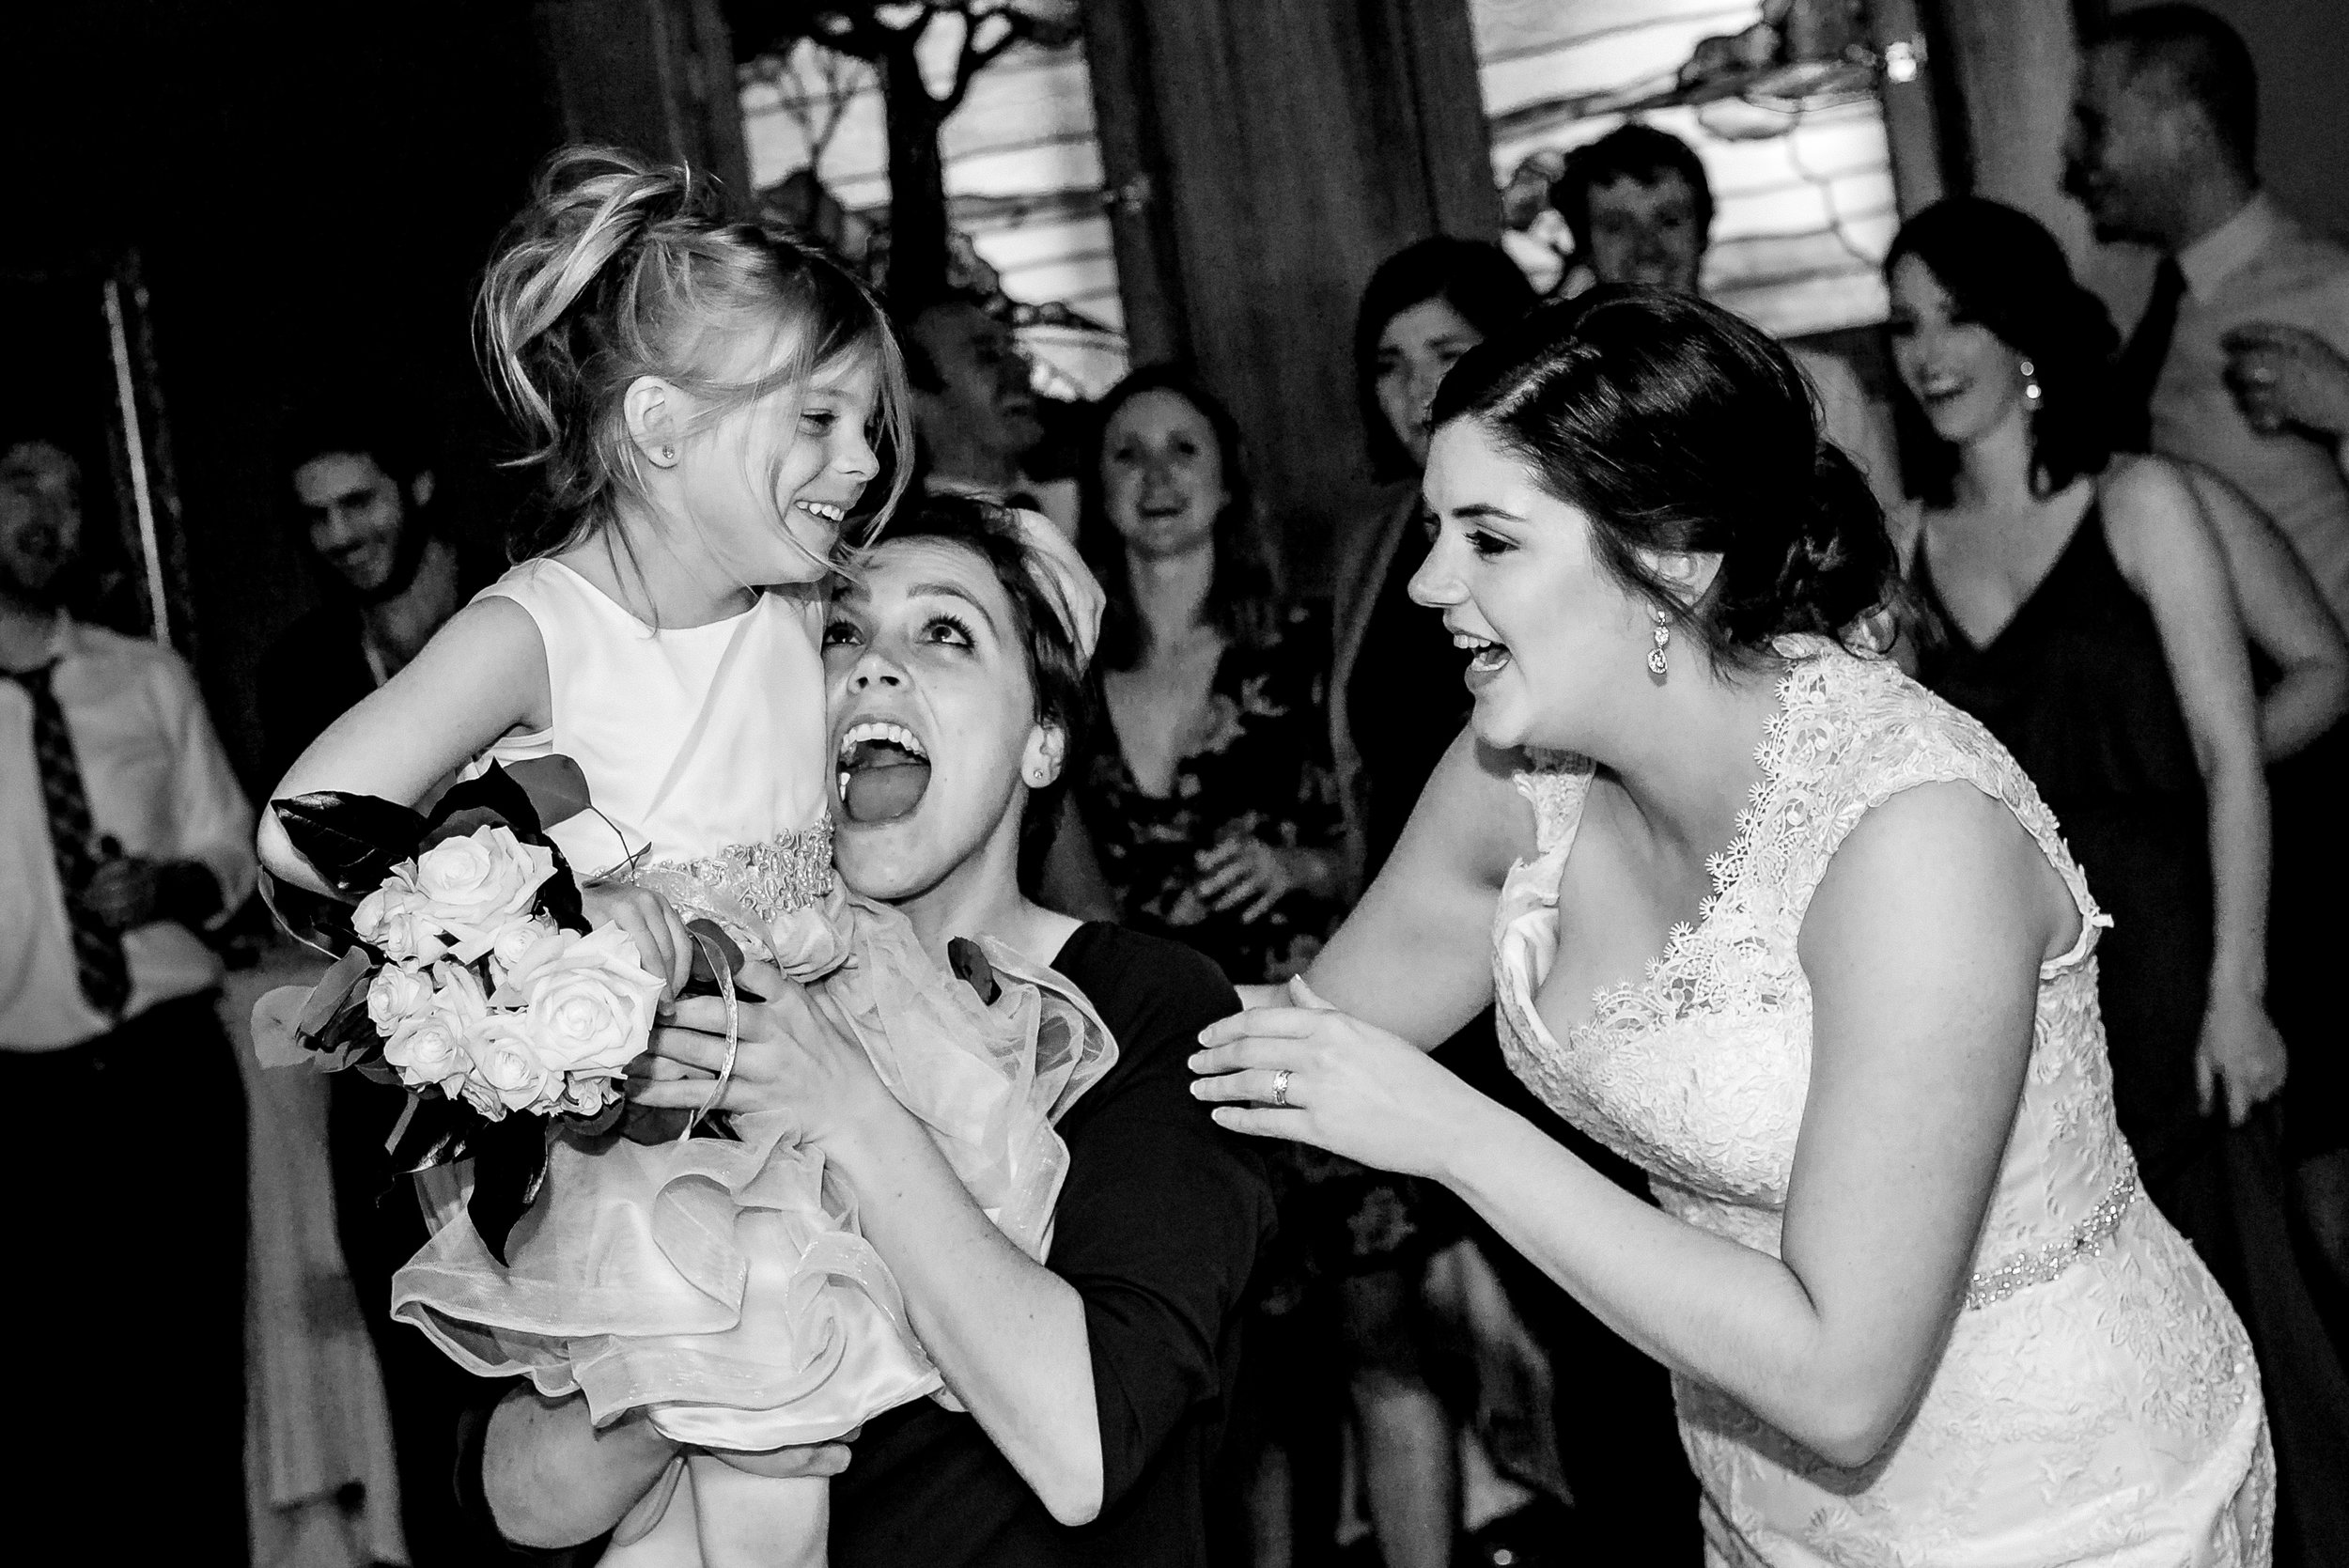 Lauren and Karl - Van Dusen Mansion Wedding and St. Olaf Catholic Church Minneapolis Wedding BW-1027.jpg